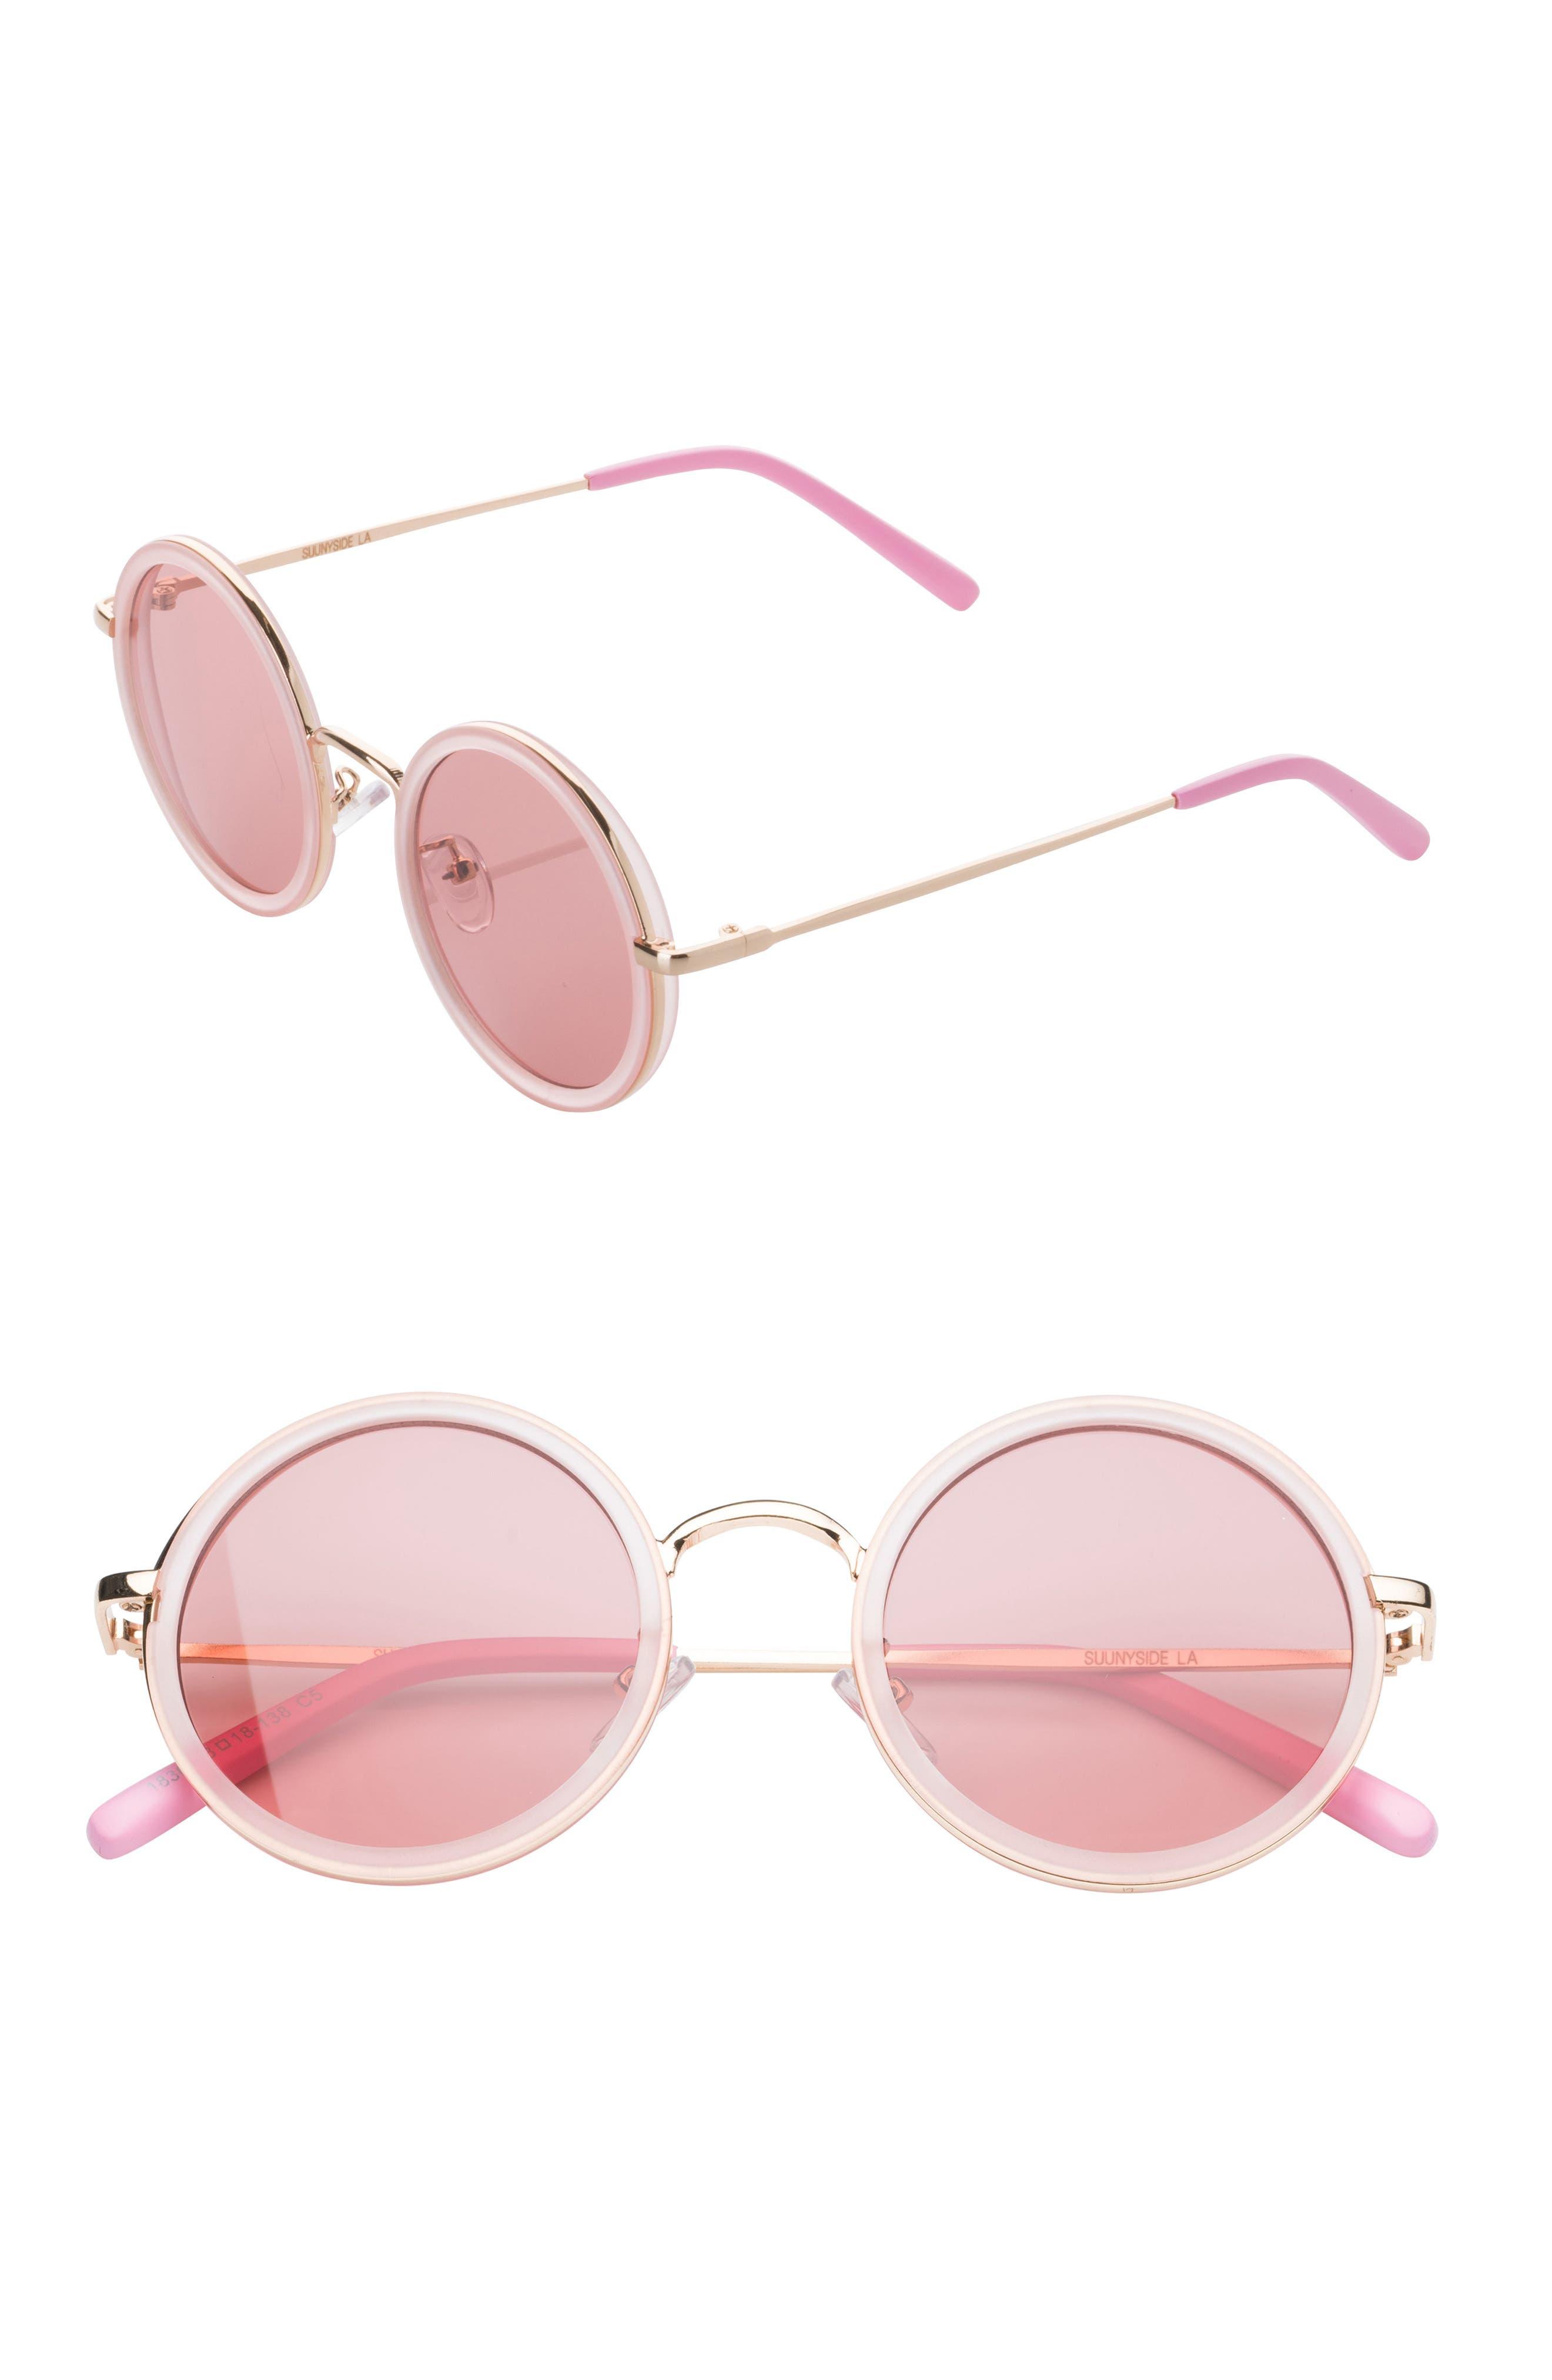 SunnySide LA 48mm Round Sunglasses